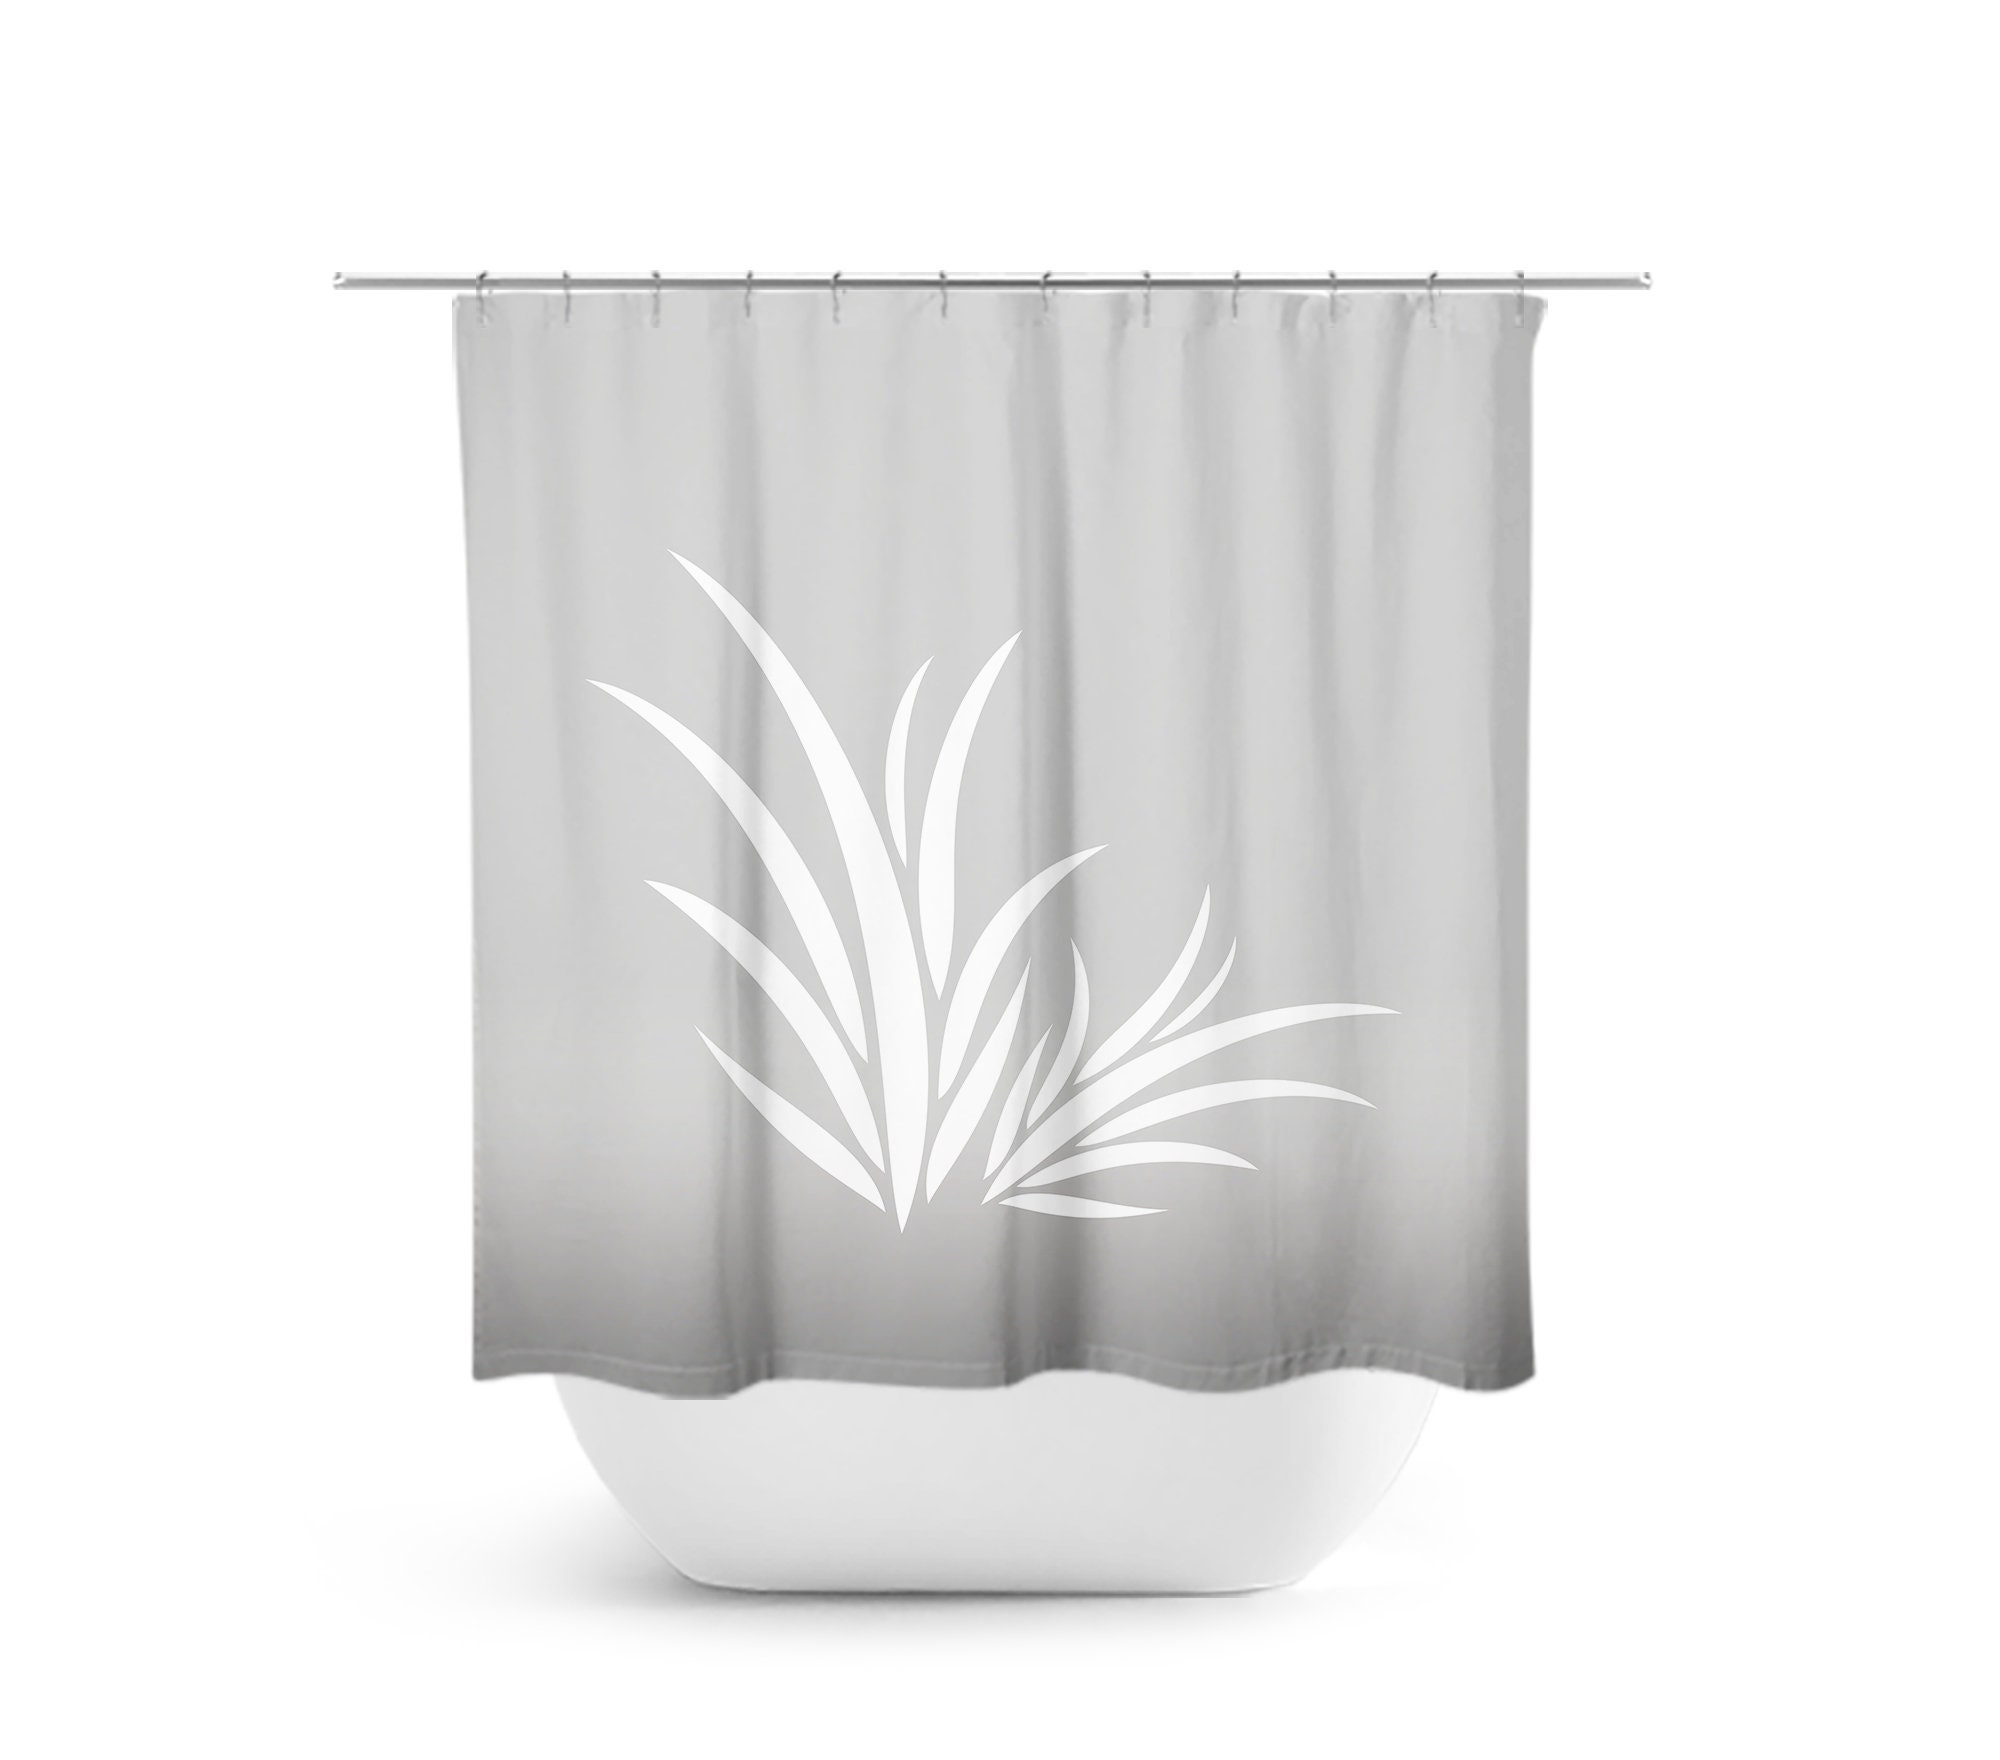 Gray Bathroom Decor Gray Shower Curtain Seaweed Bath